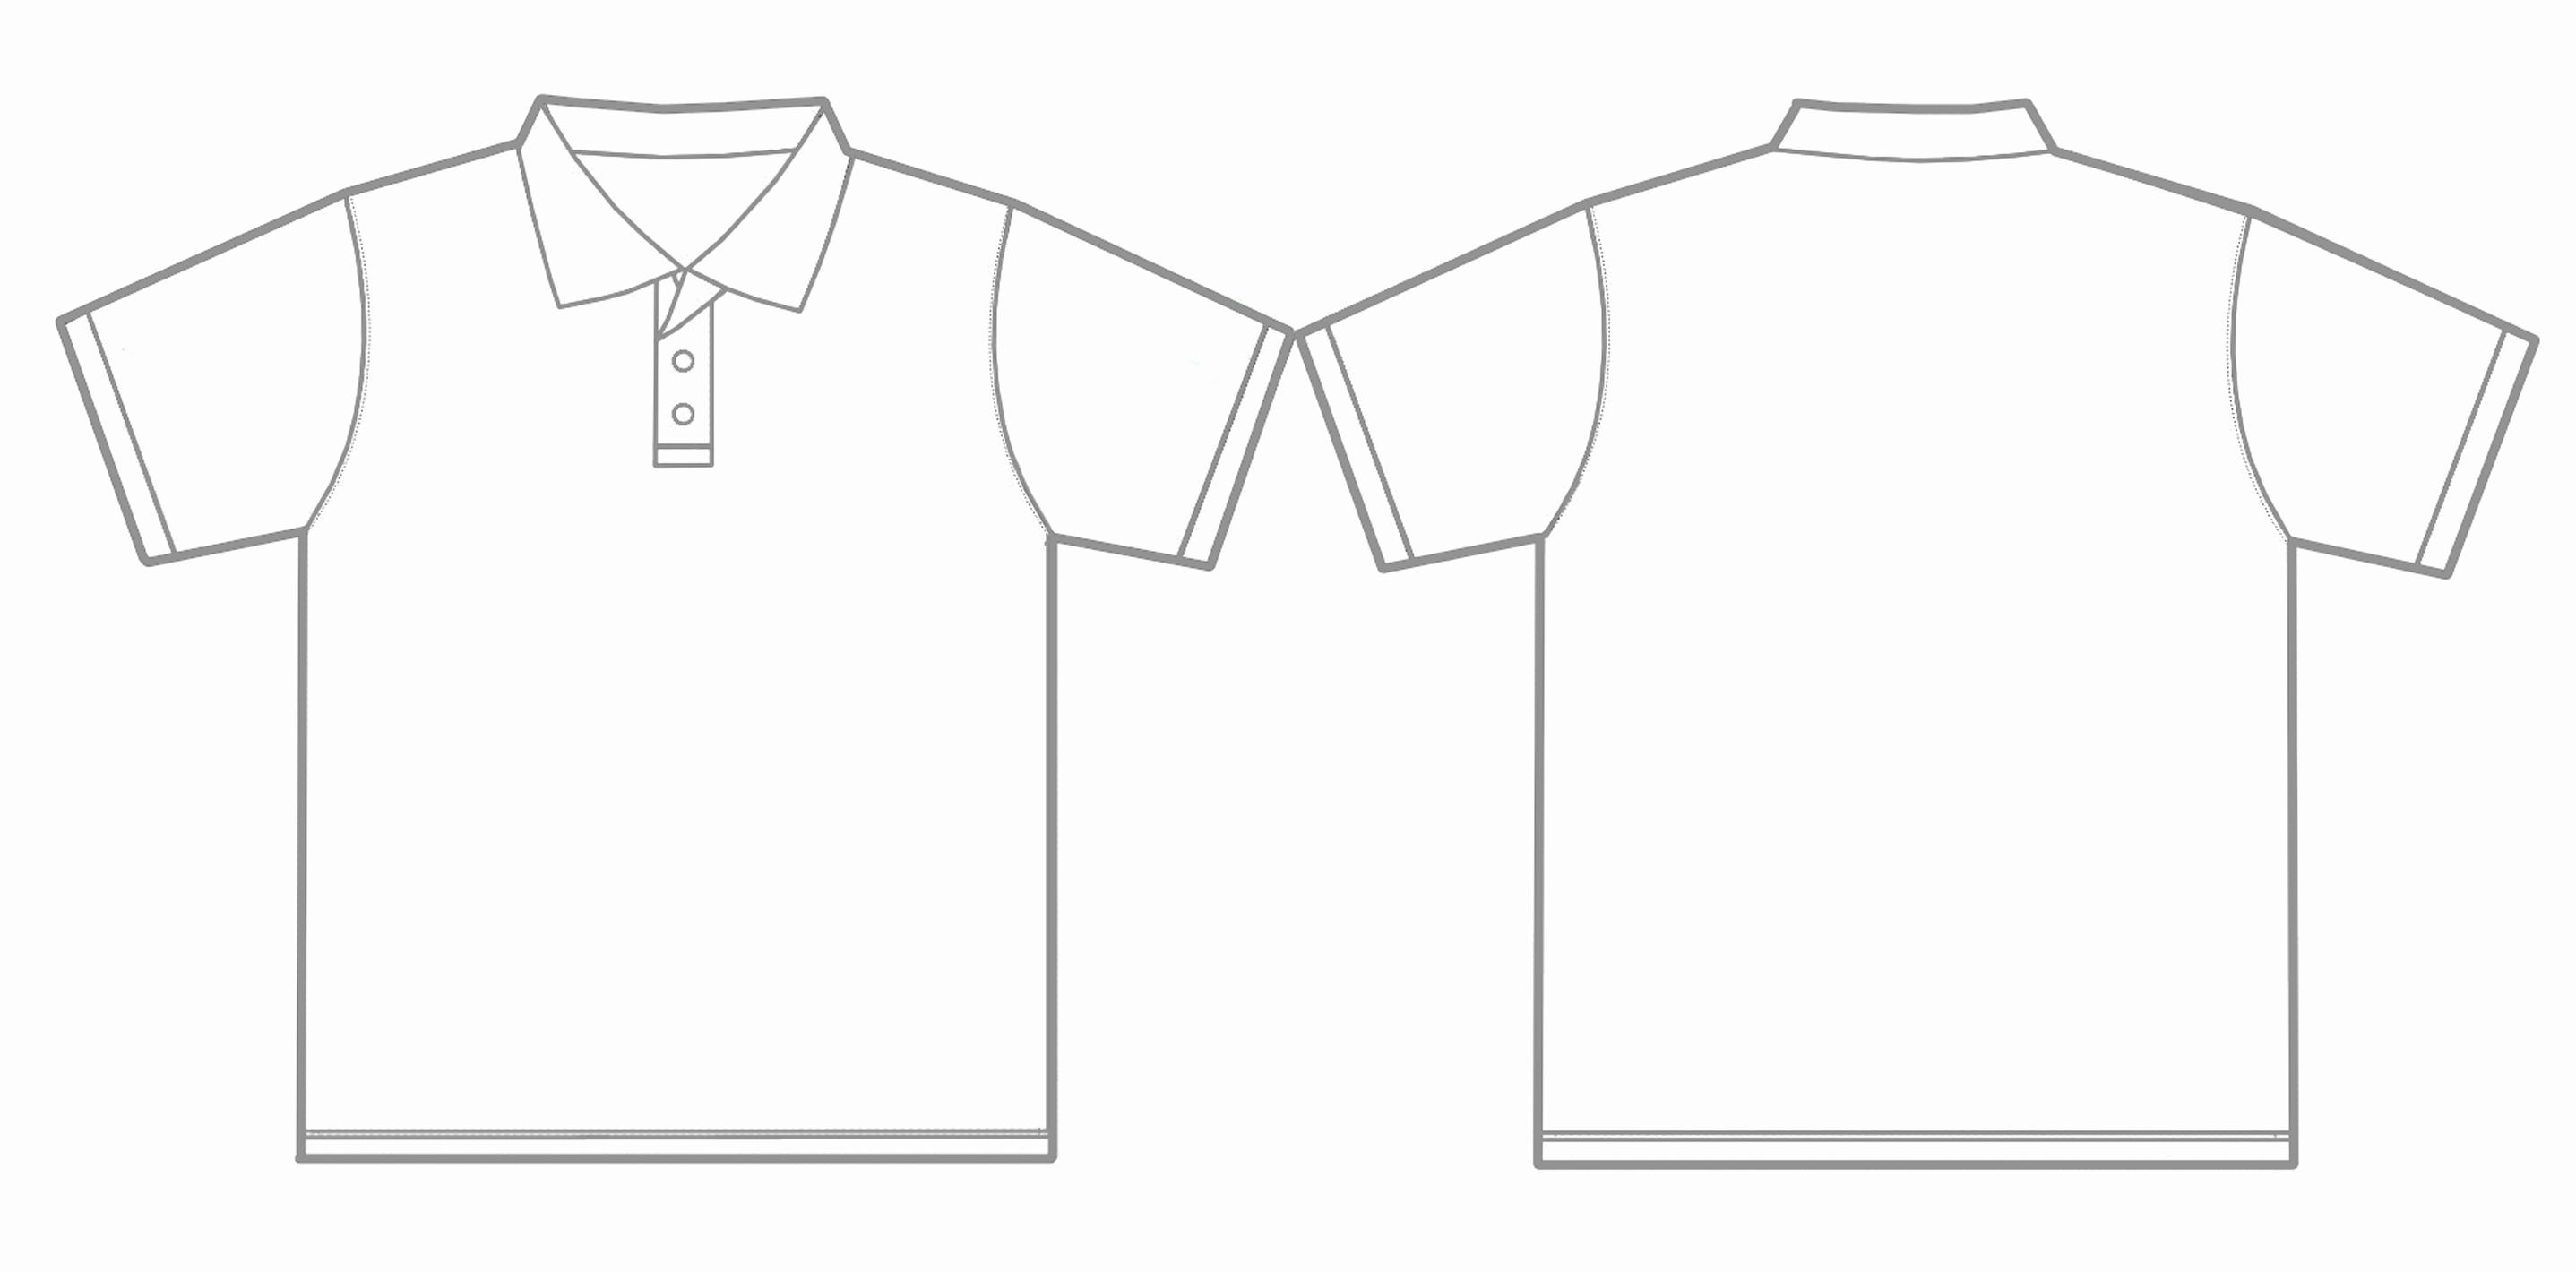 Free T Shirt Template Fresh Free T Shirt Template Download Free Clip Art Free Clip